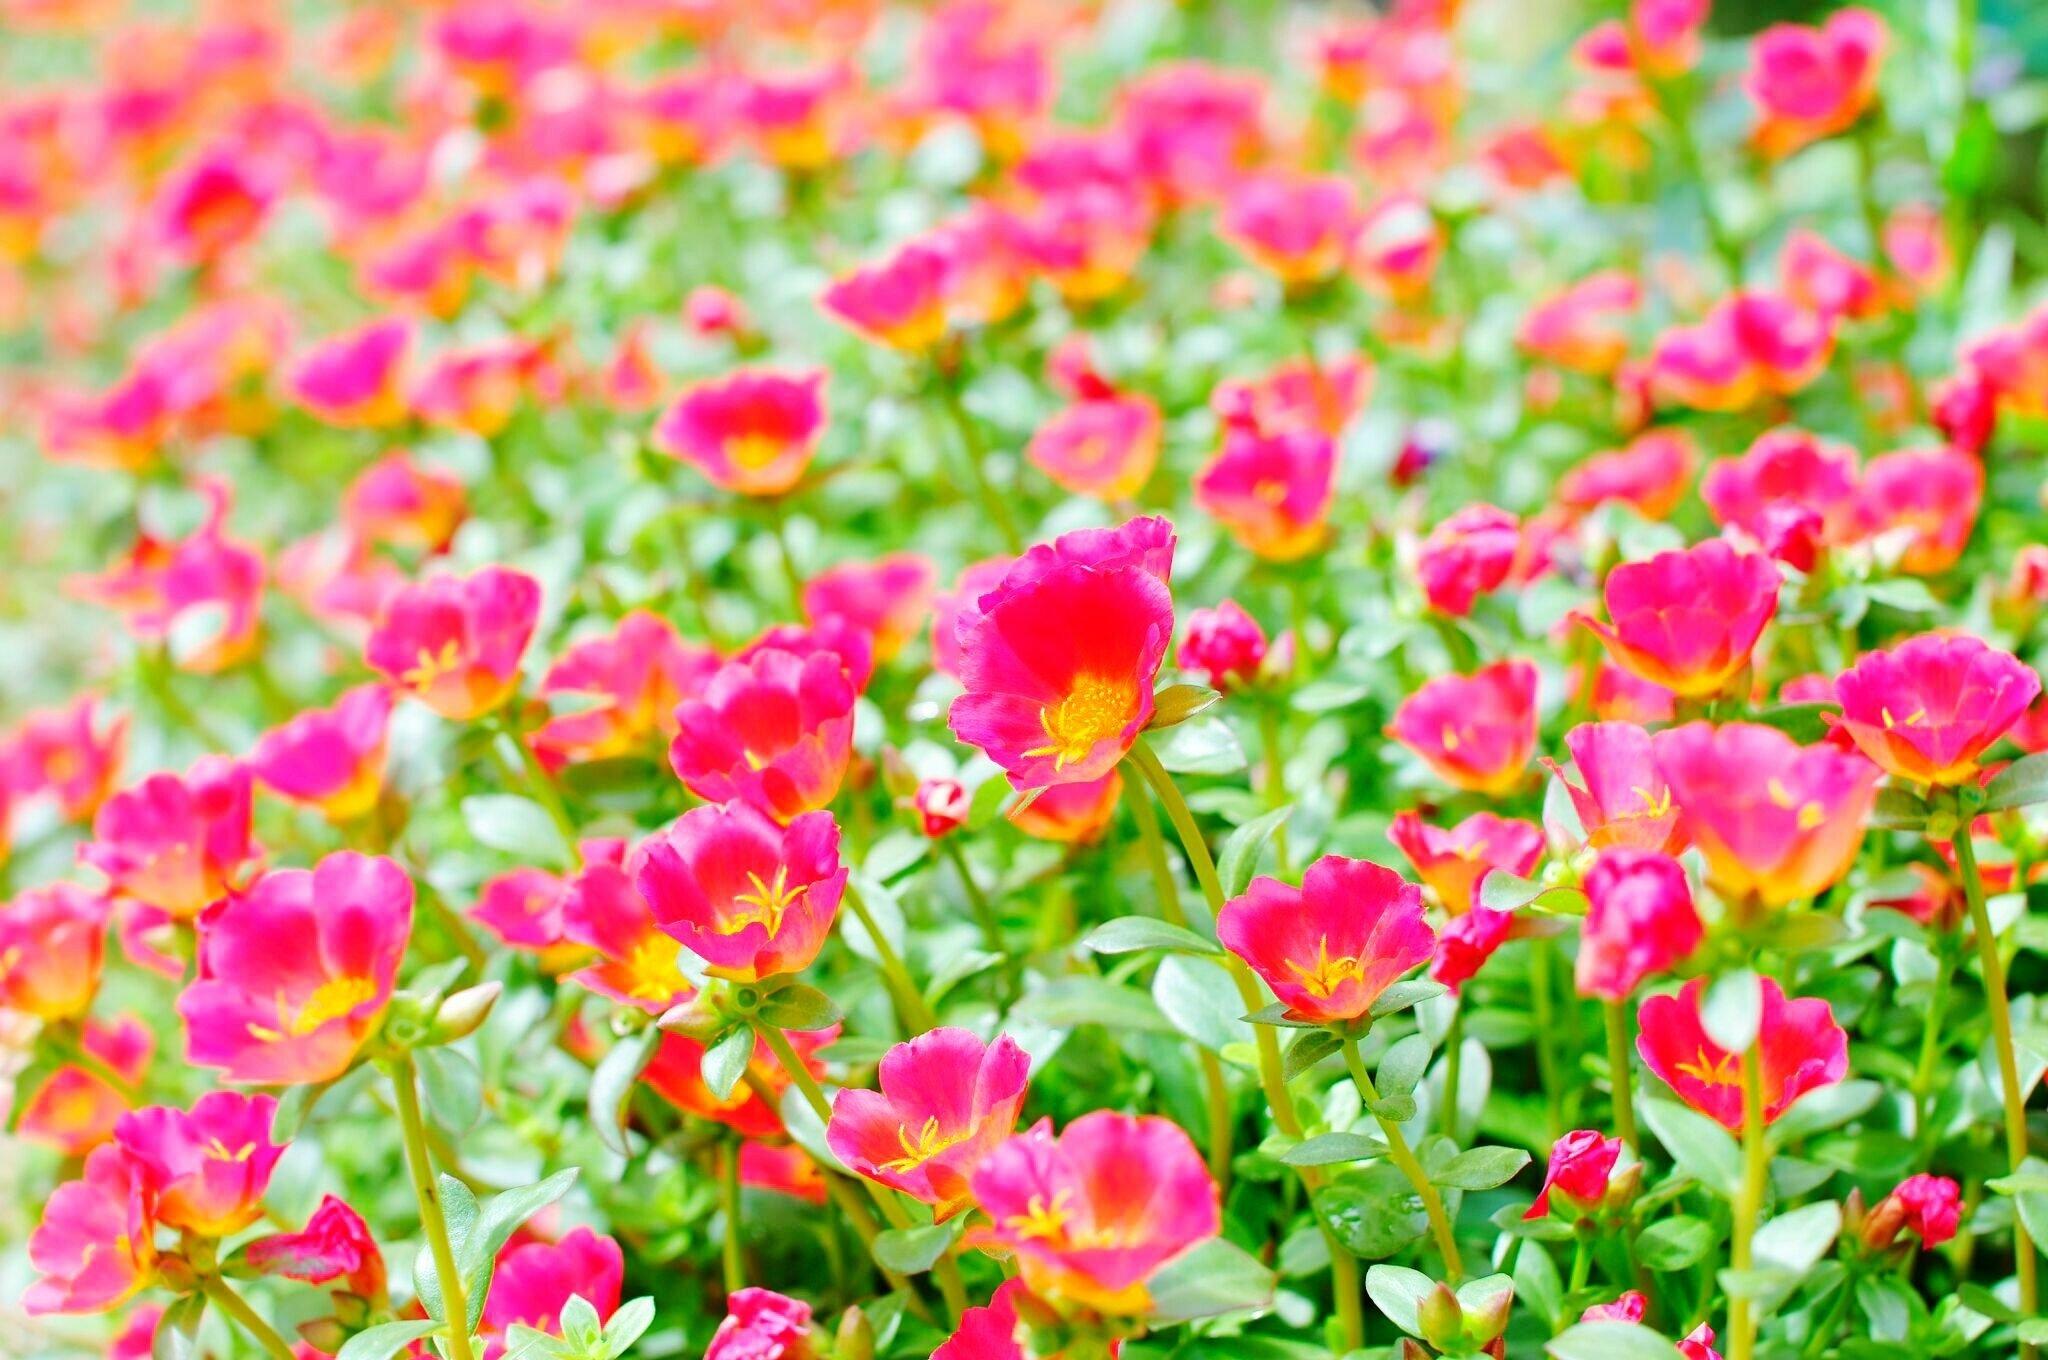 Close-Up Portulaca Grandiflora Flower Field